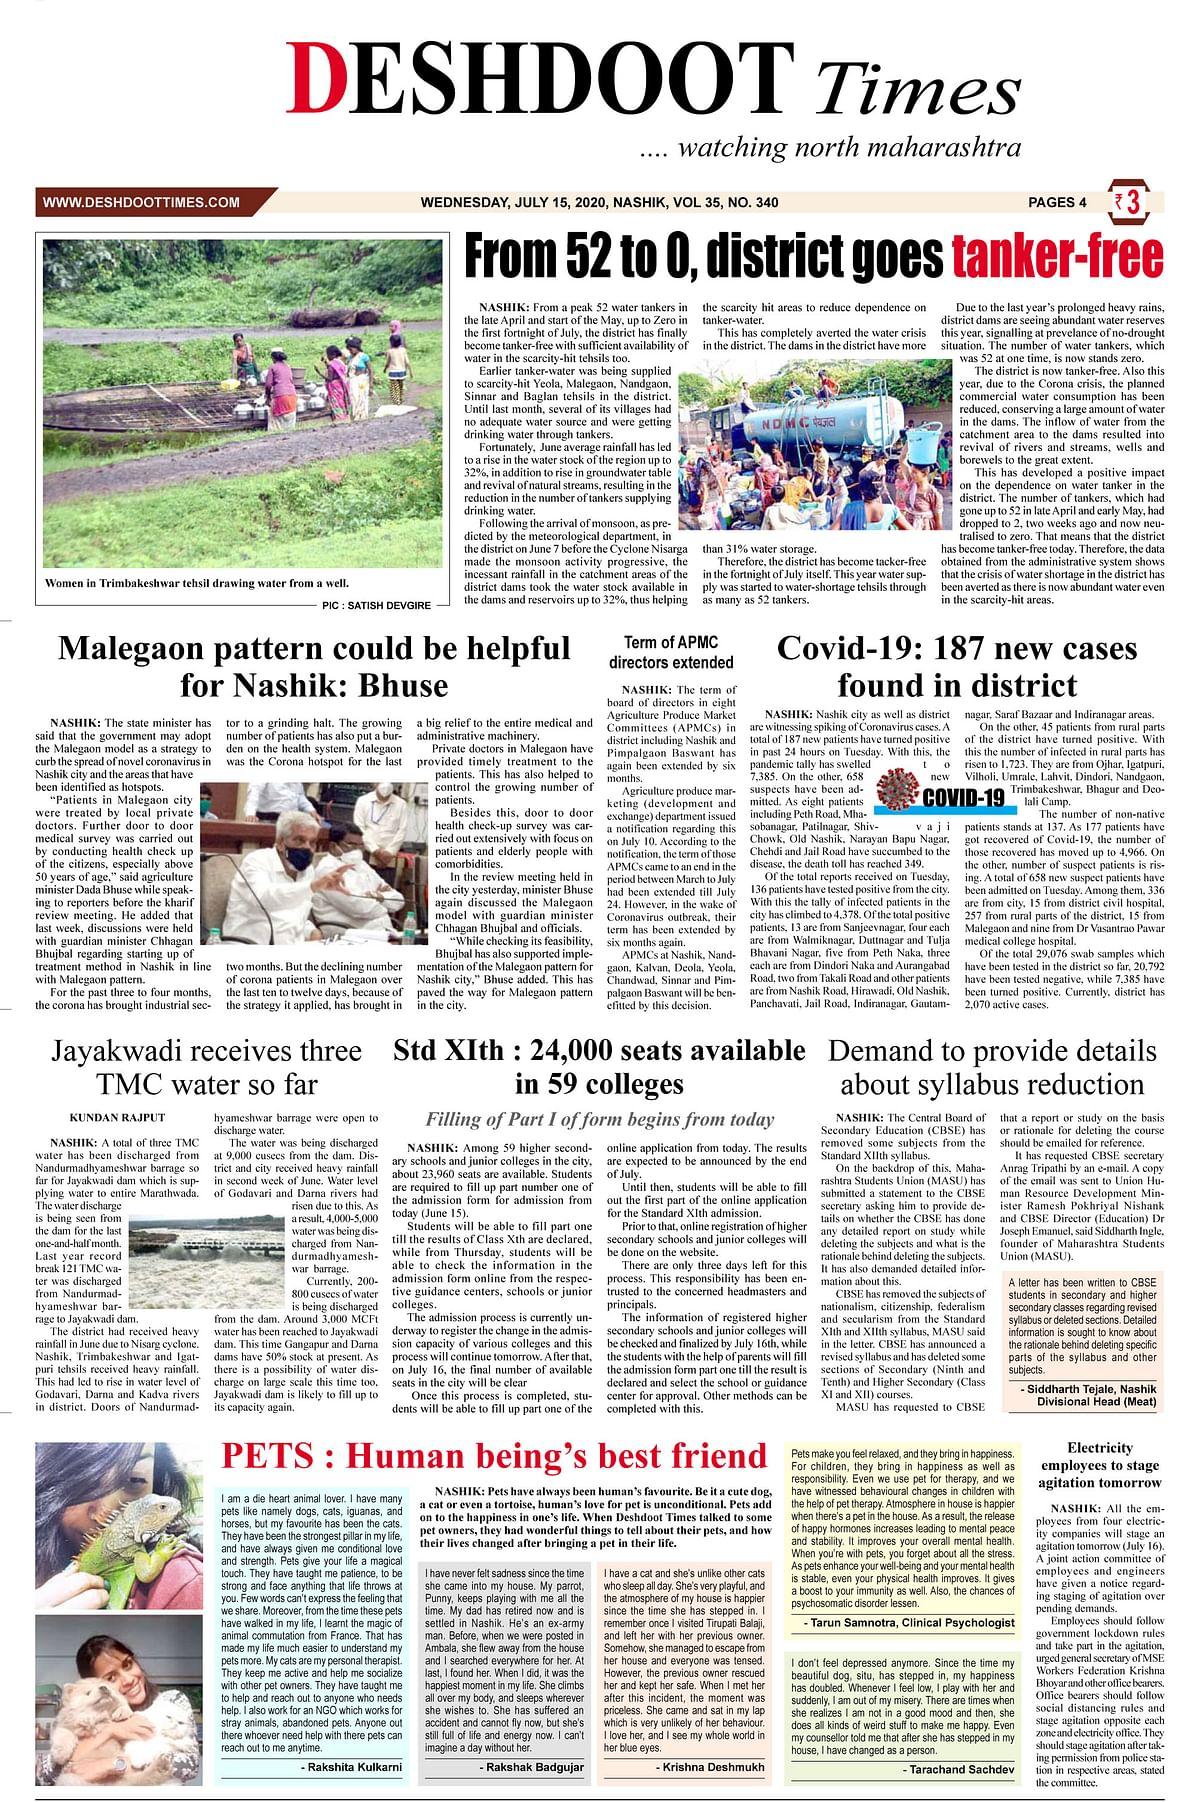 Deshdoot Times E Paper, 15 July 2020